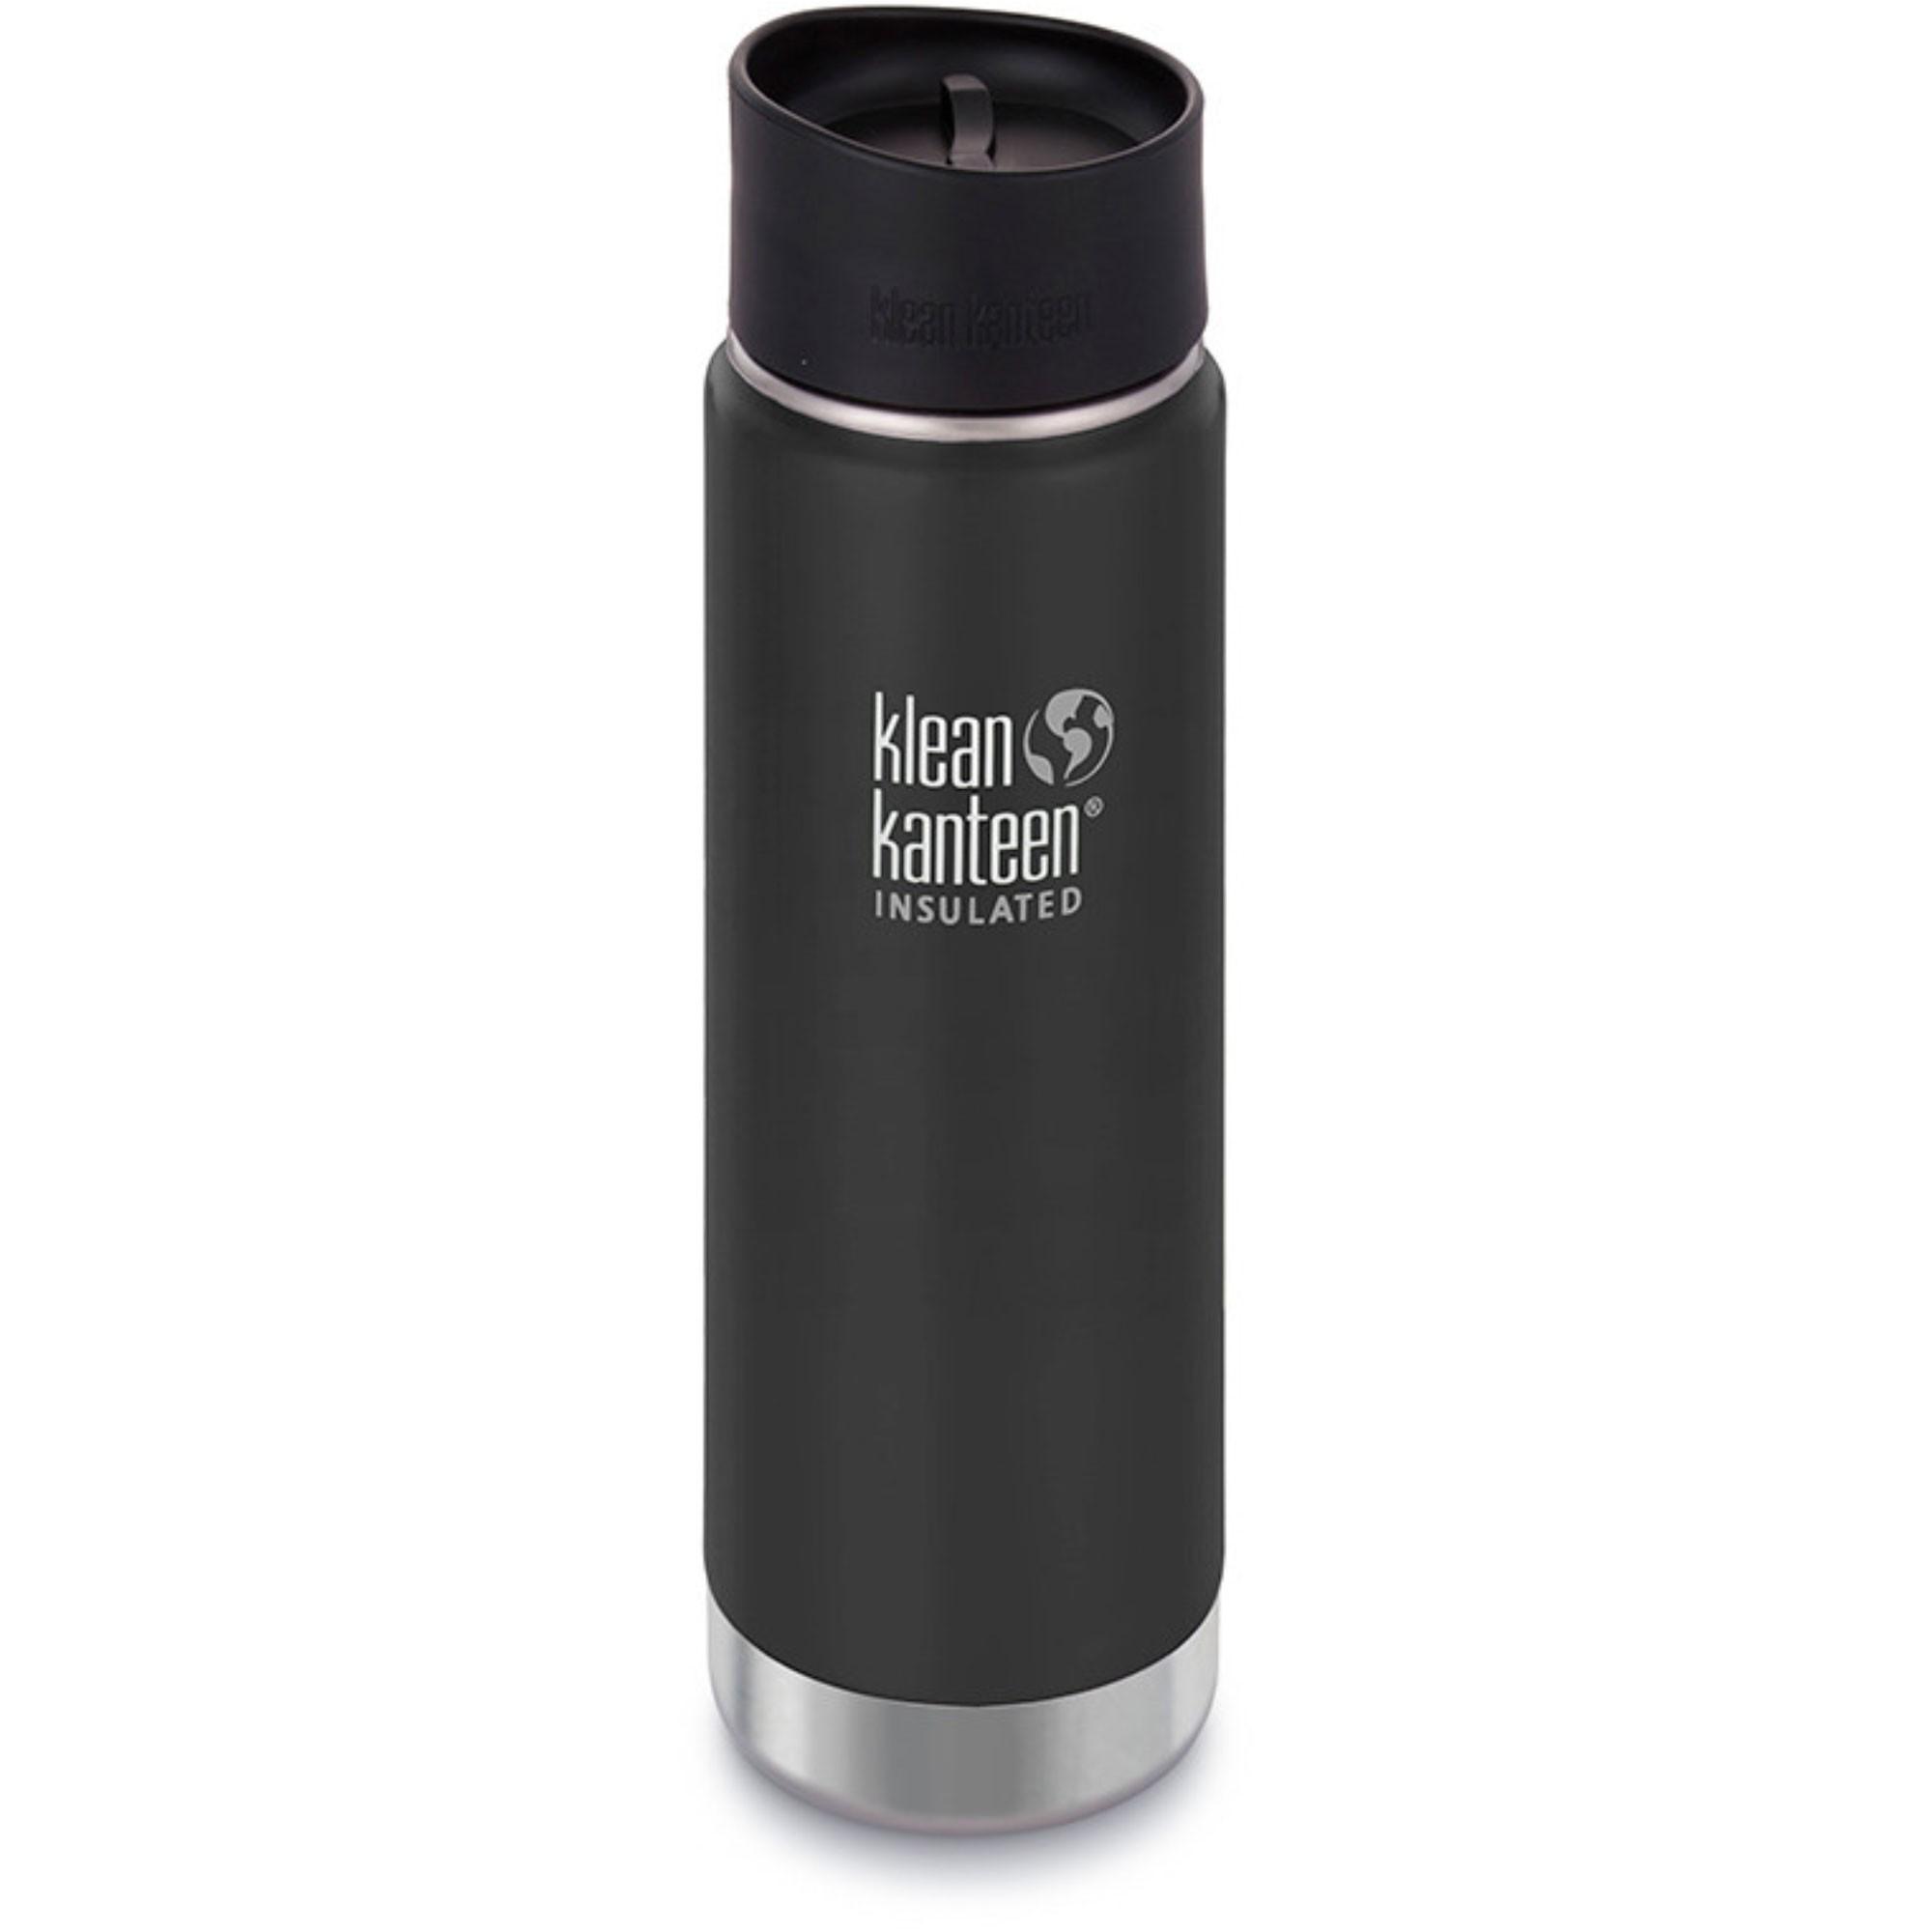 KLEAN KANTEEN - Insulated Cafe Cap Flask - 592ml - Shale Black